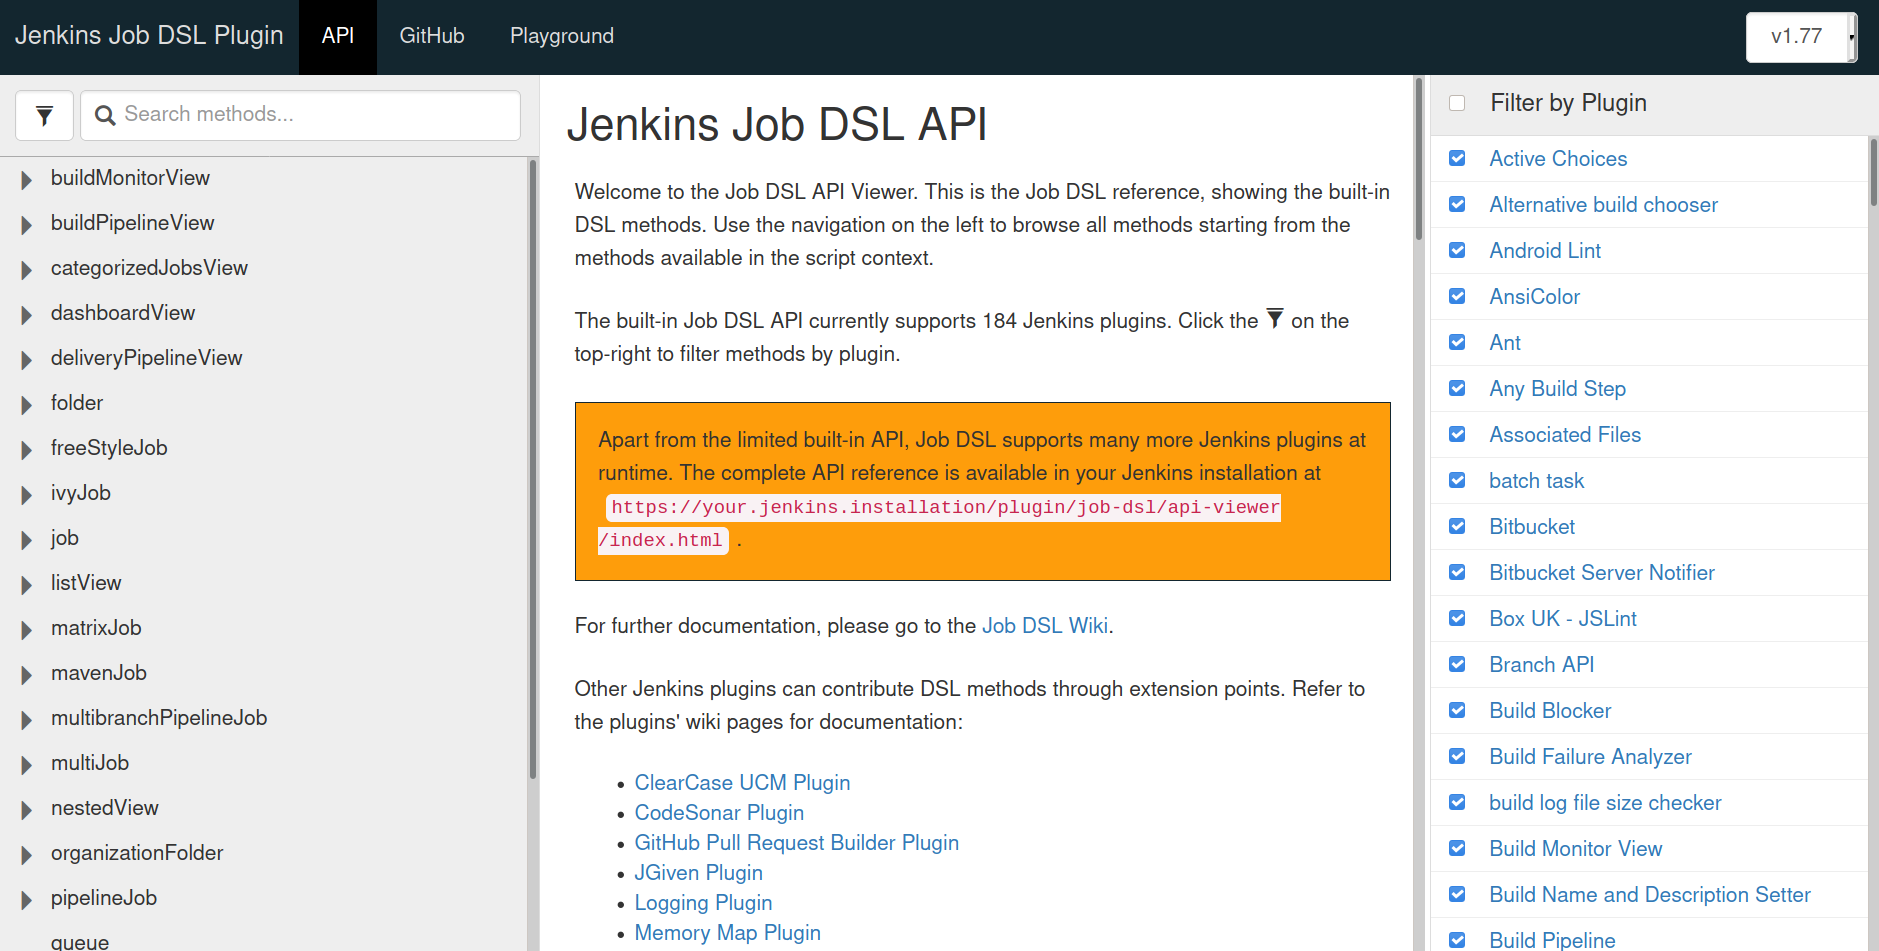 Jenkins Job DSL API Reference web page